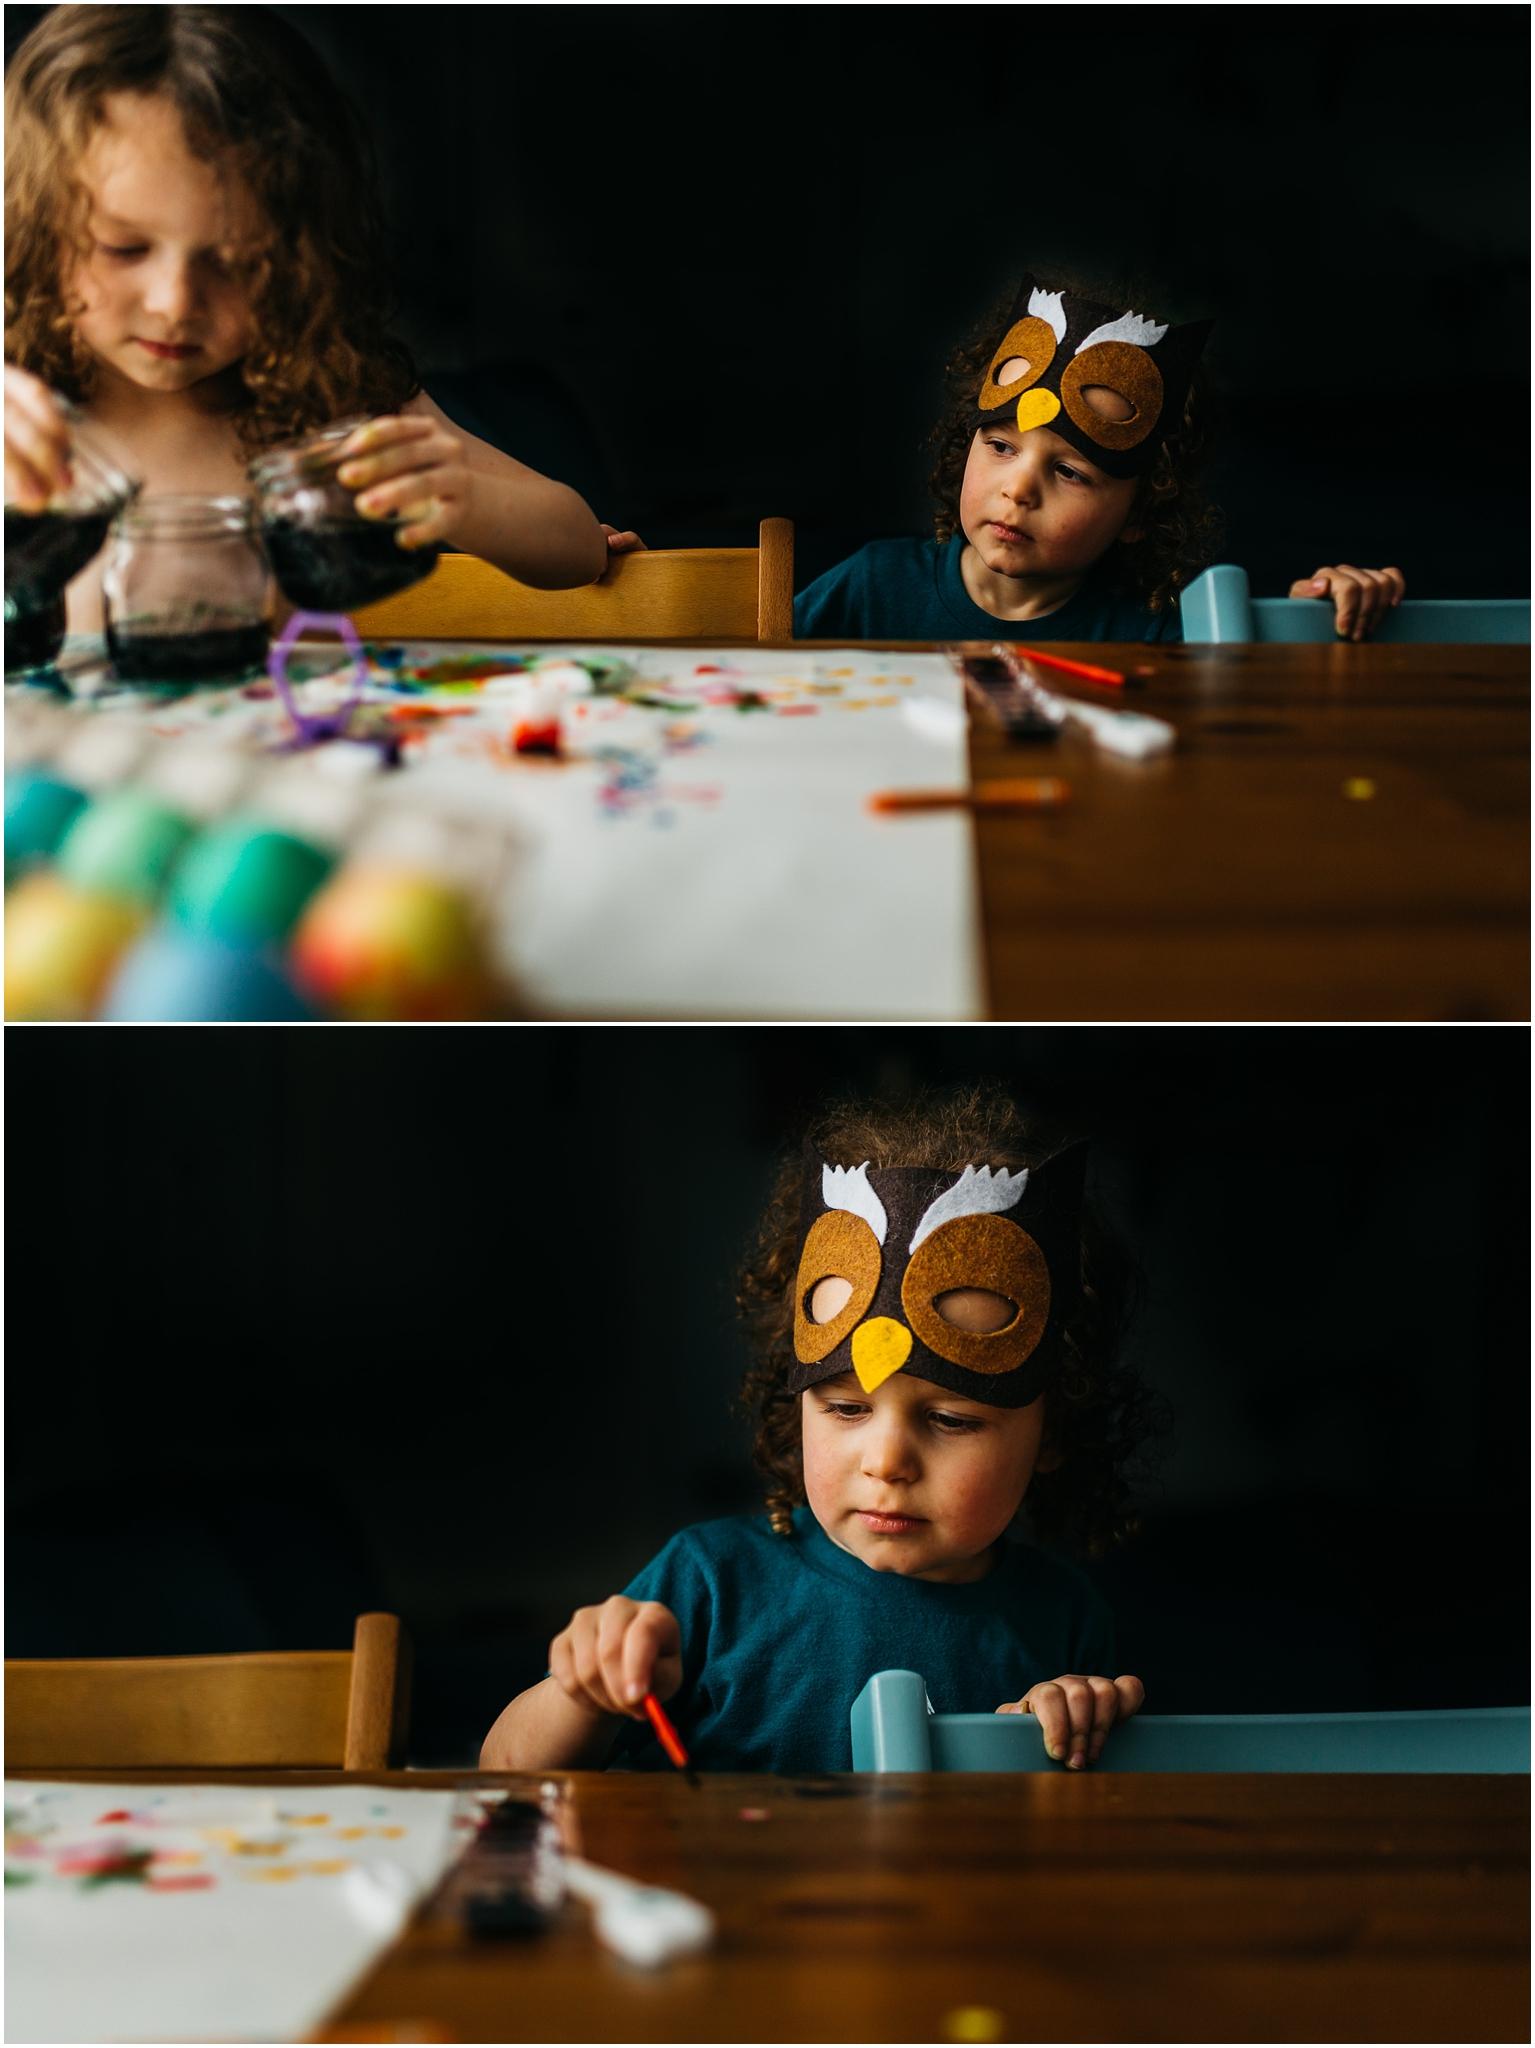 Easter Egg Painting - Edmonton Photographer - Edmonton Family Photographer -  Easter Eggs - Easter 2018 - Crayons on Easter Eggs - Edmonton Documentary Photographer - Family Photography - Documentary Photography - Owl Mask - Owl Costume - Edmonton Documentary Photographer - Lifestyle Photography